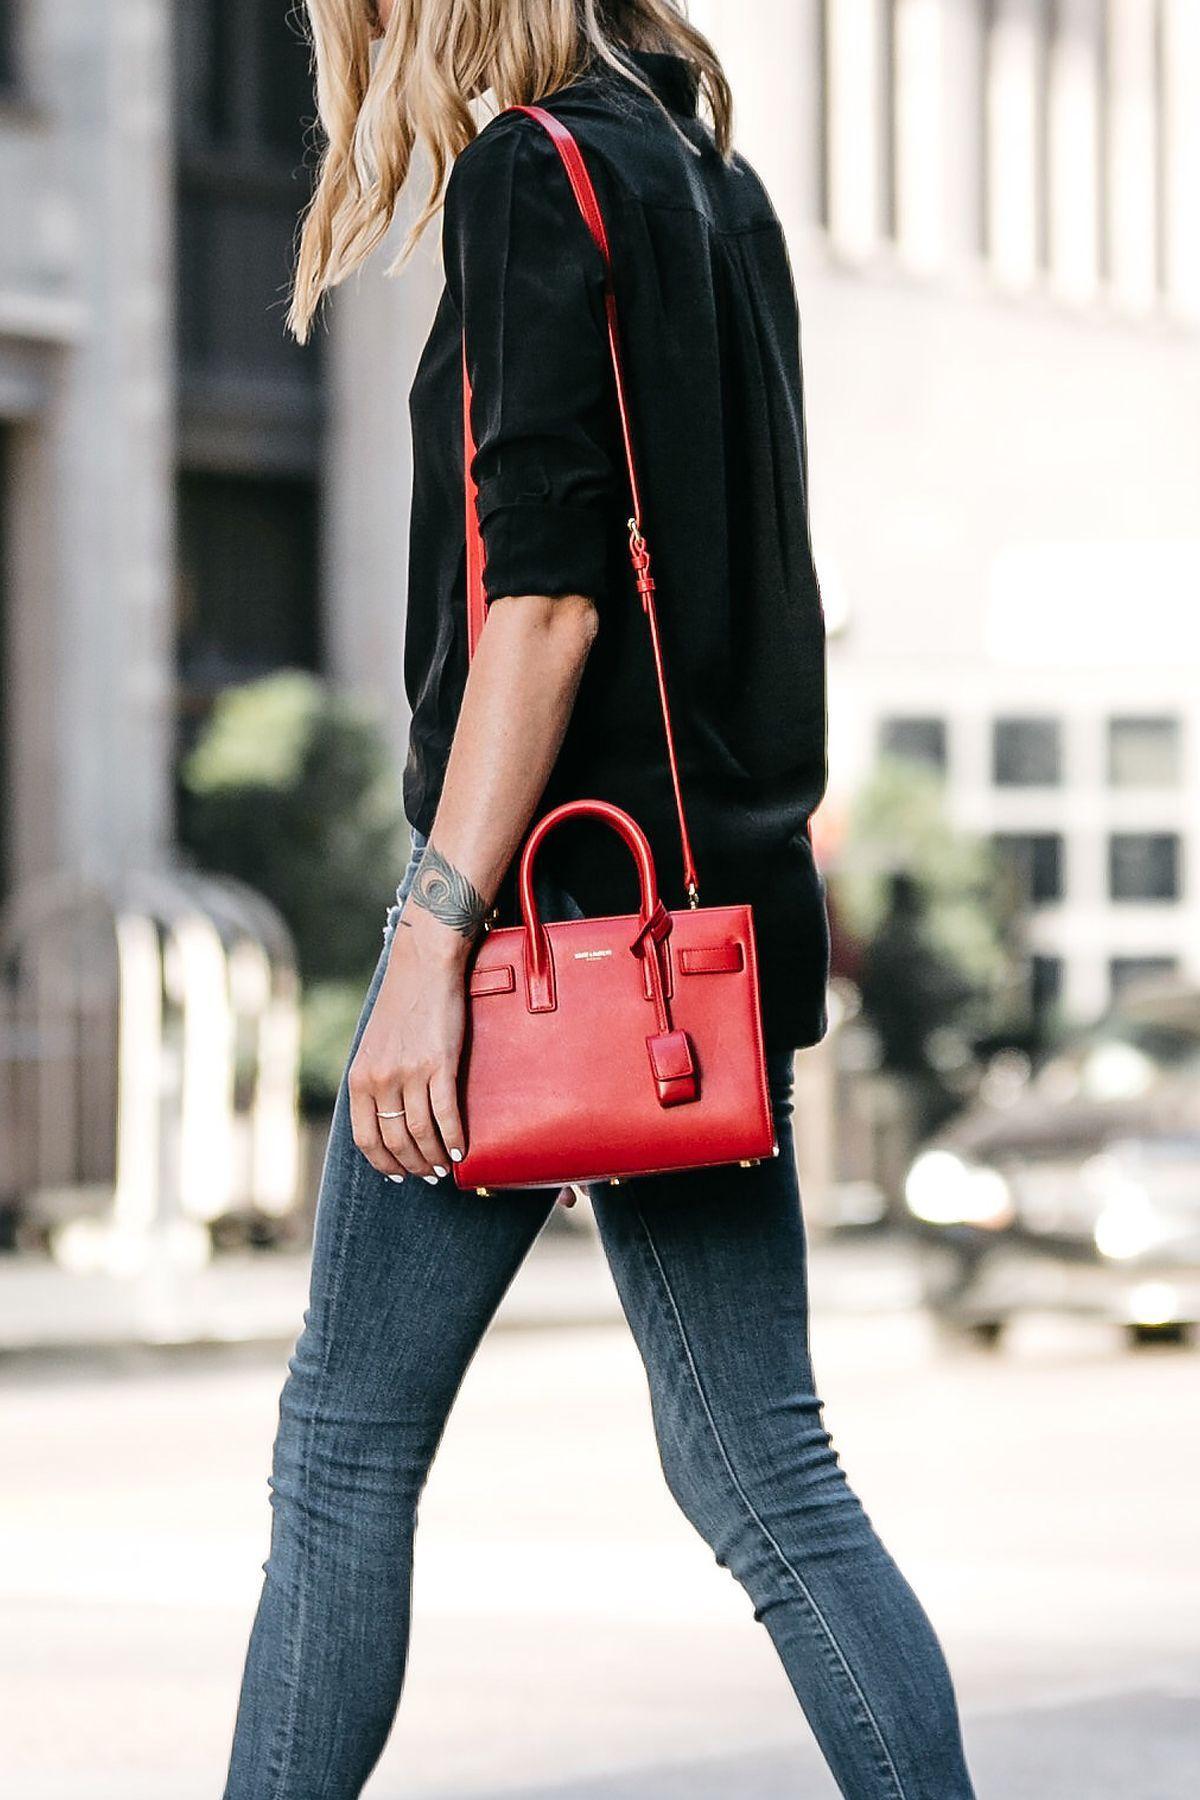 90ebf9de8d6 Saint Laurent Sac de Jour Red Handbag Black Button Up Shirt Denim Skinny  Jeans Fashion Jackson Dallas Blogger Fashion Blogger Street Style